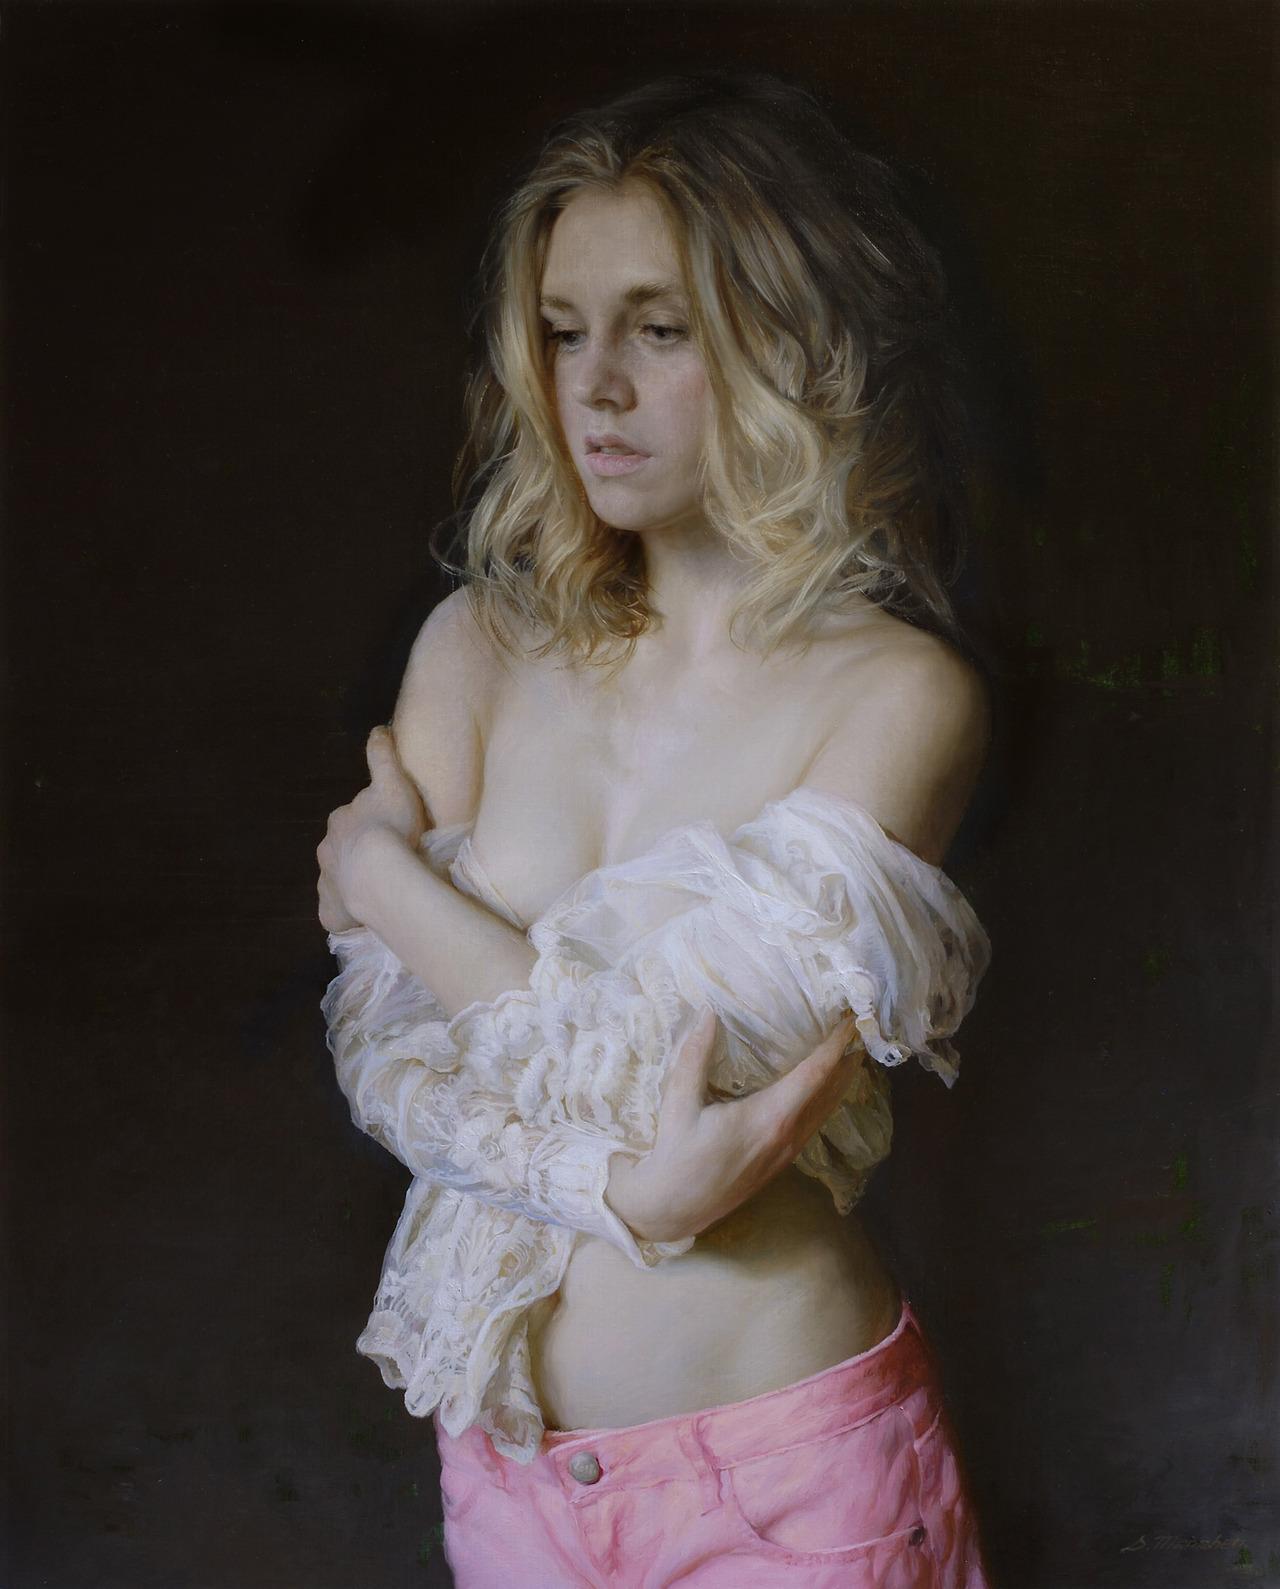 Women's images by a Russian realist artist Sergey Marshennikov - 35